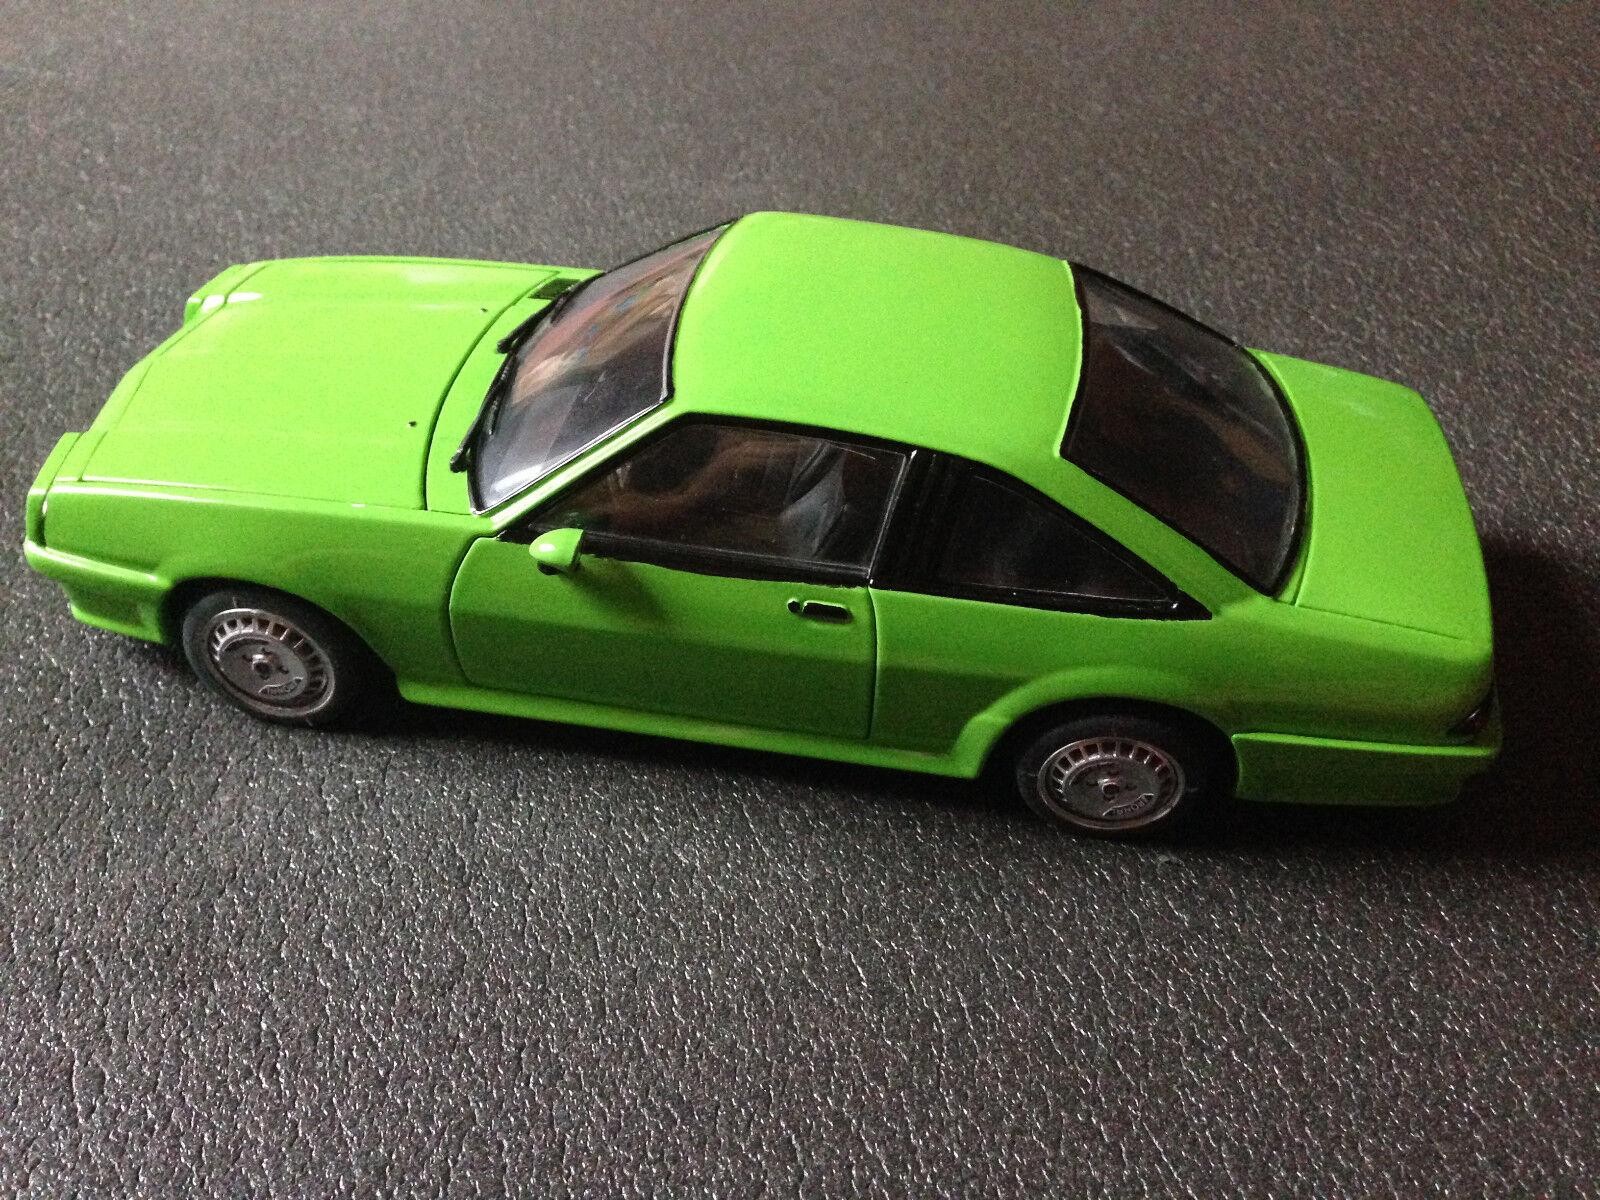 Opel Manta B Maaskantje New Kinder Turbo Nitro Ronal  Alufelgen  Tuning 1 18